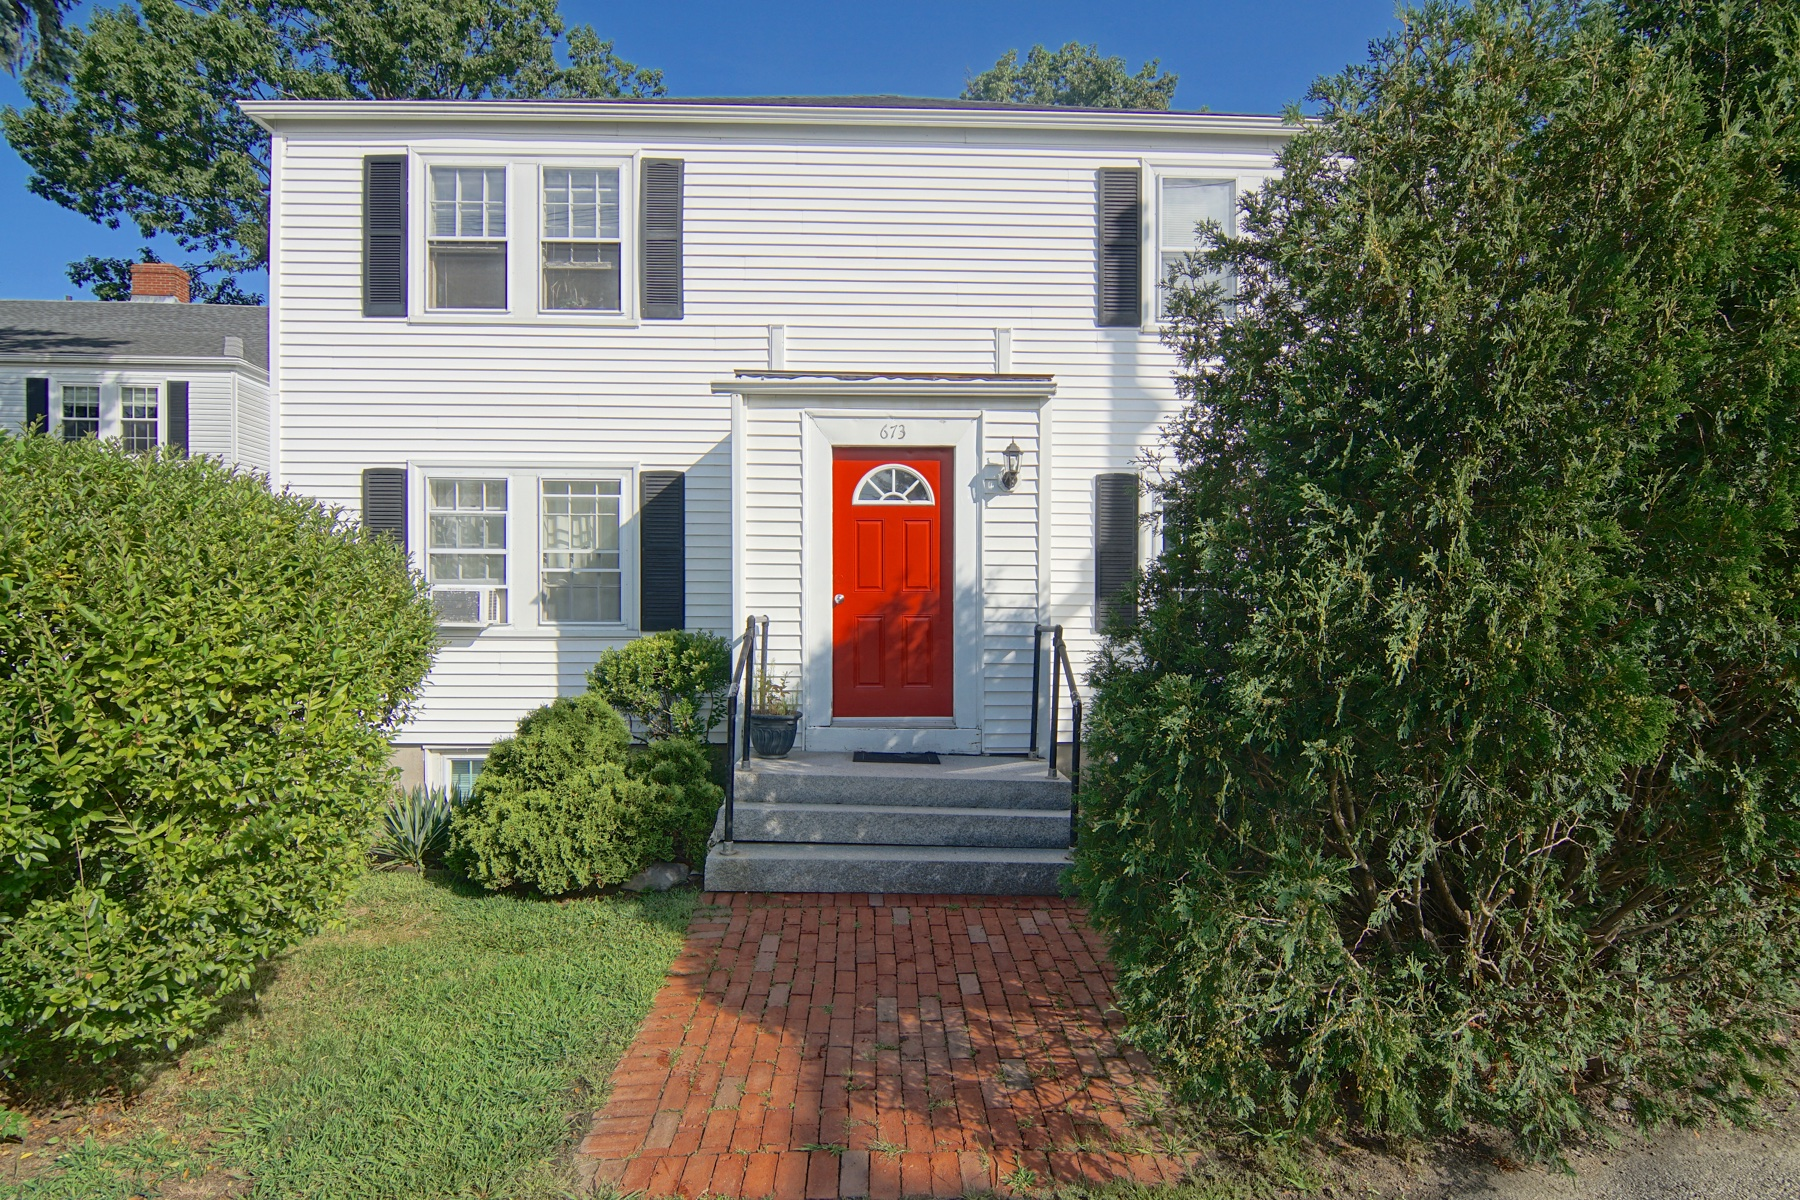 Condominiums for Sale at Little Harbor Condominium 673 South Street Unit 3 Portsmouth, New Hampshire 03801 United States